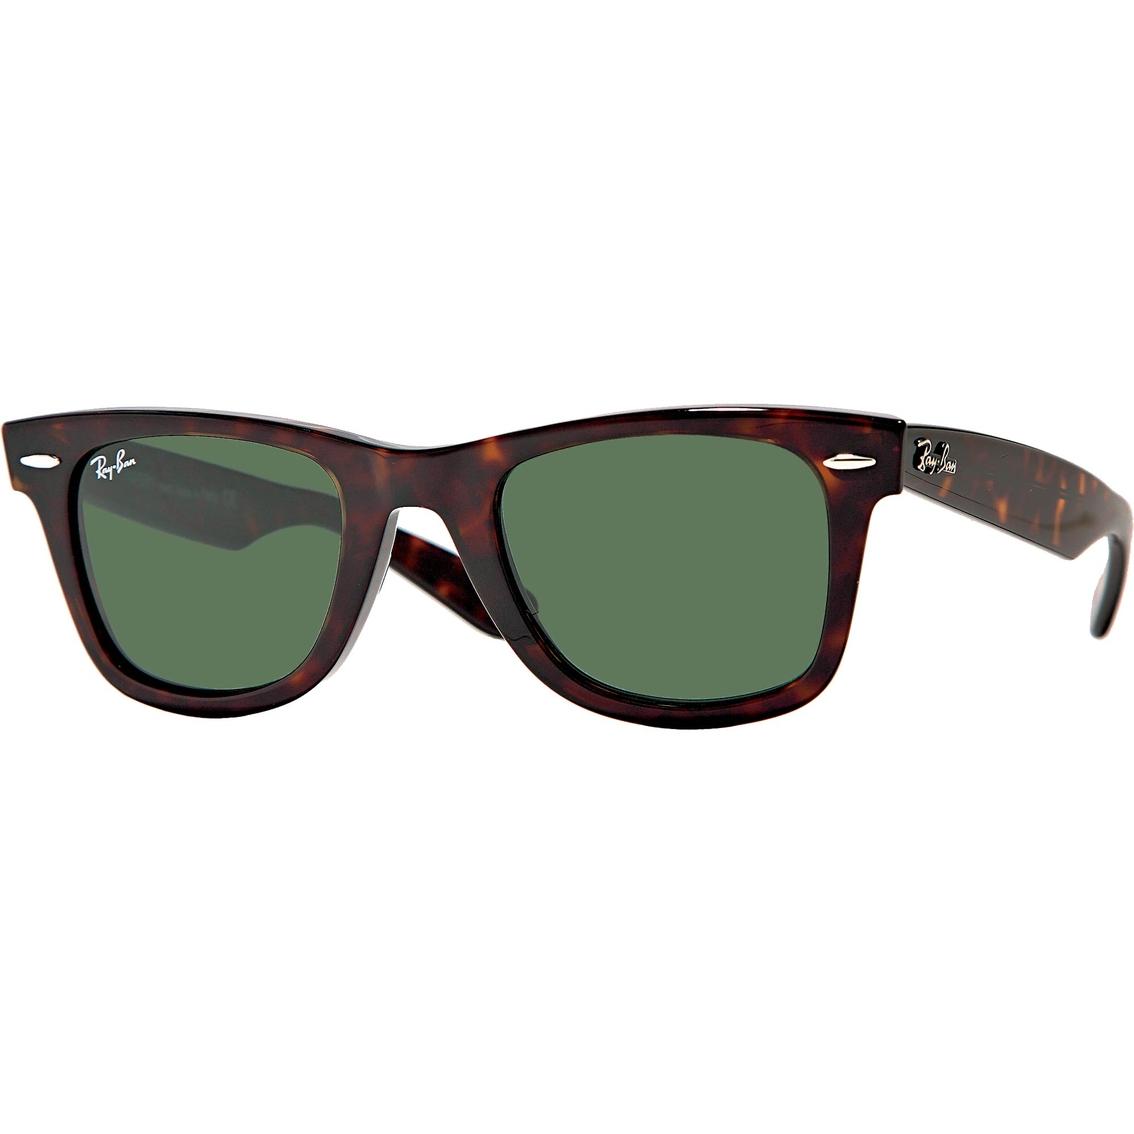 Ray-ban Original Wayfarer Sunglasses | Men\'s Sunglasses | Handbags ...